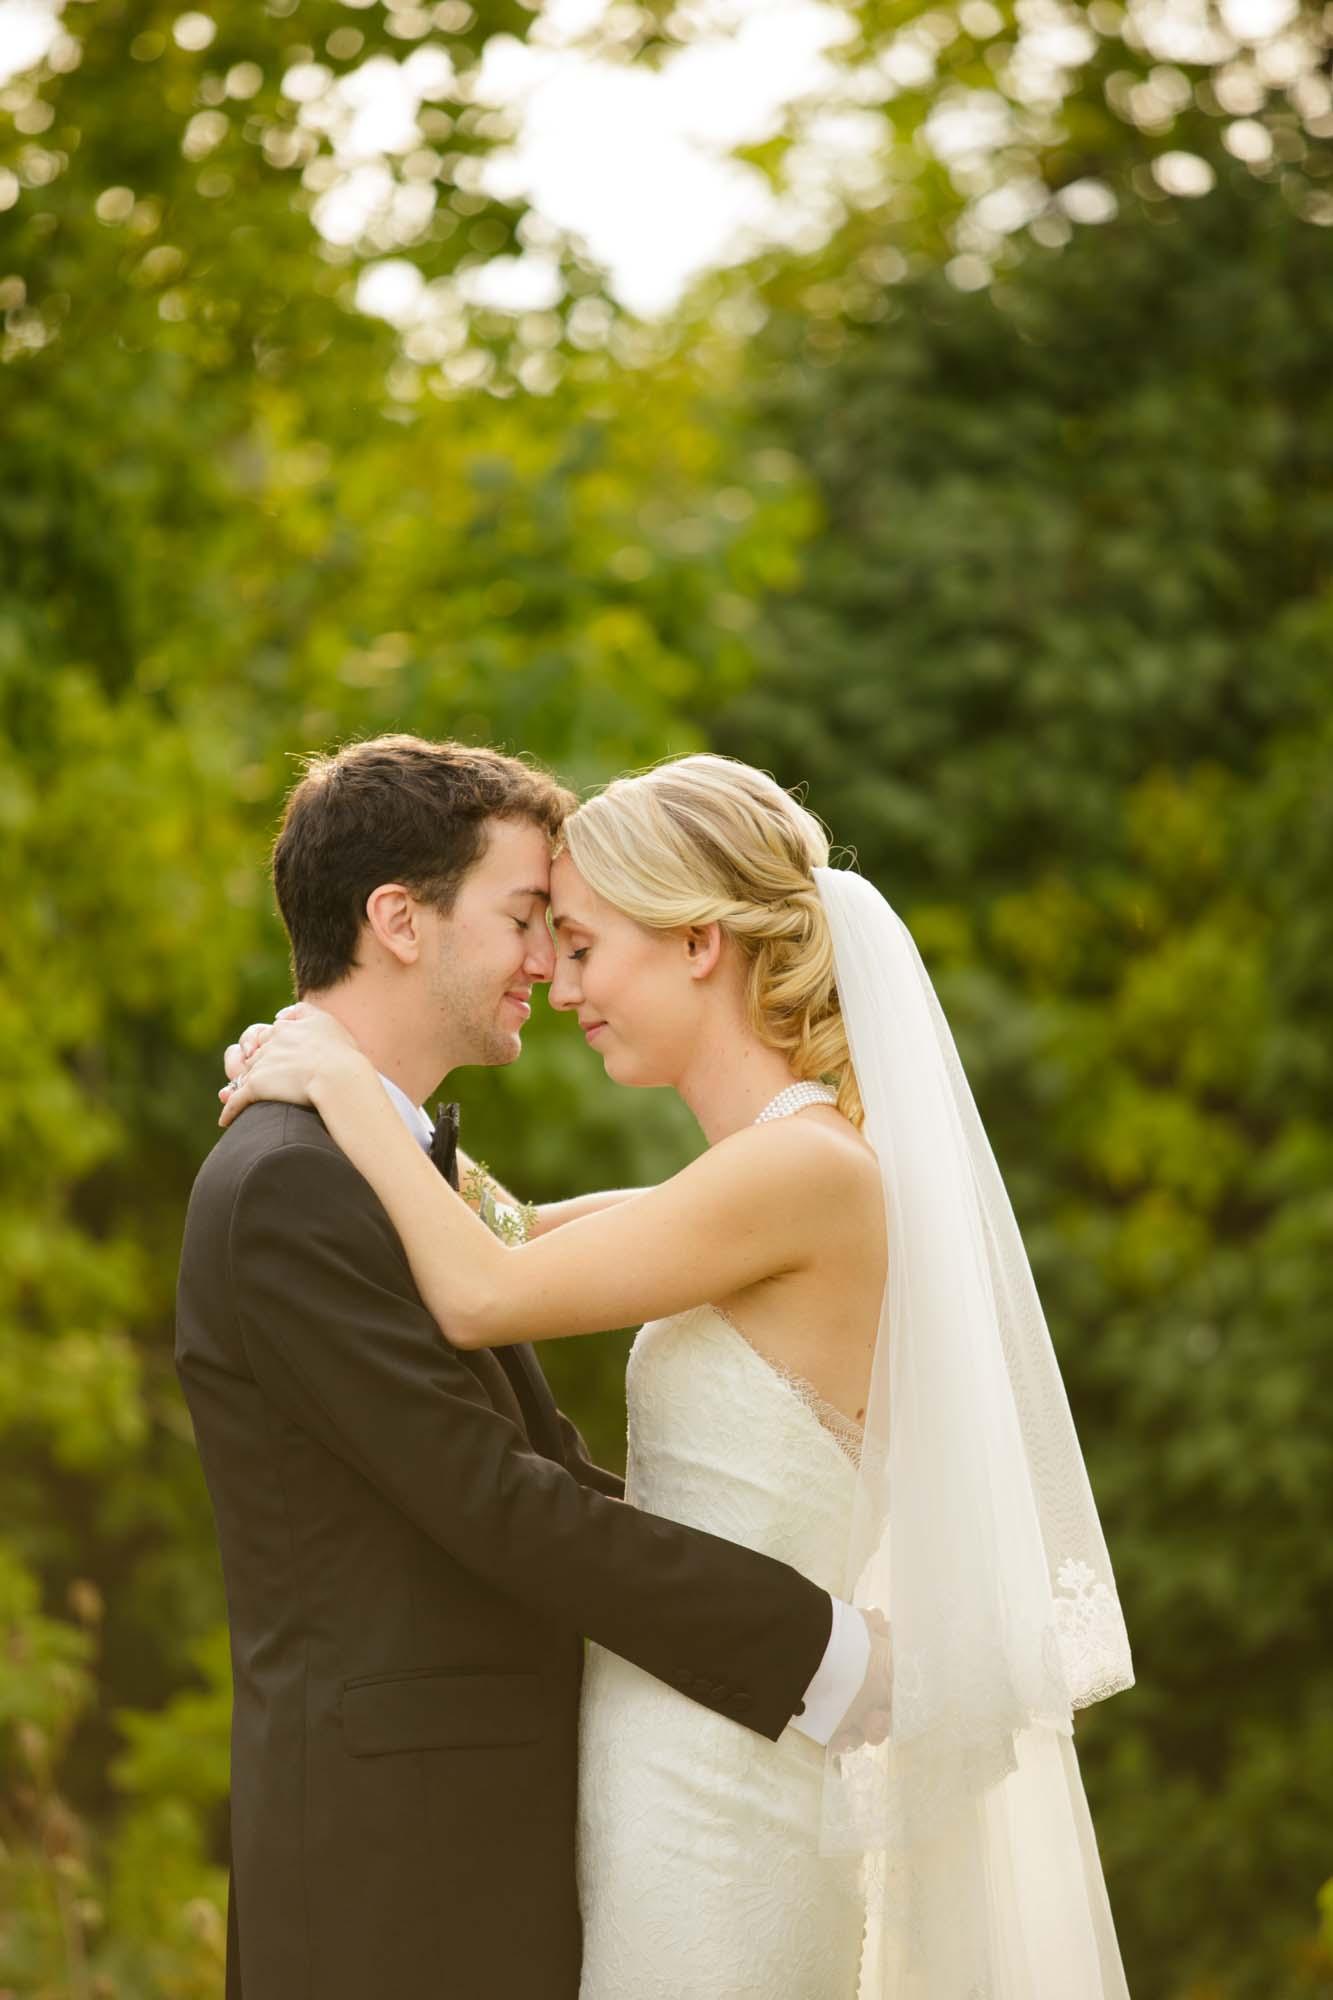 Attention all Brides!